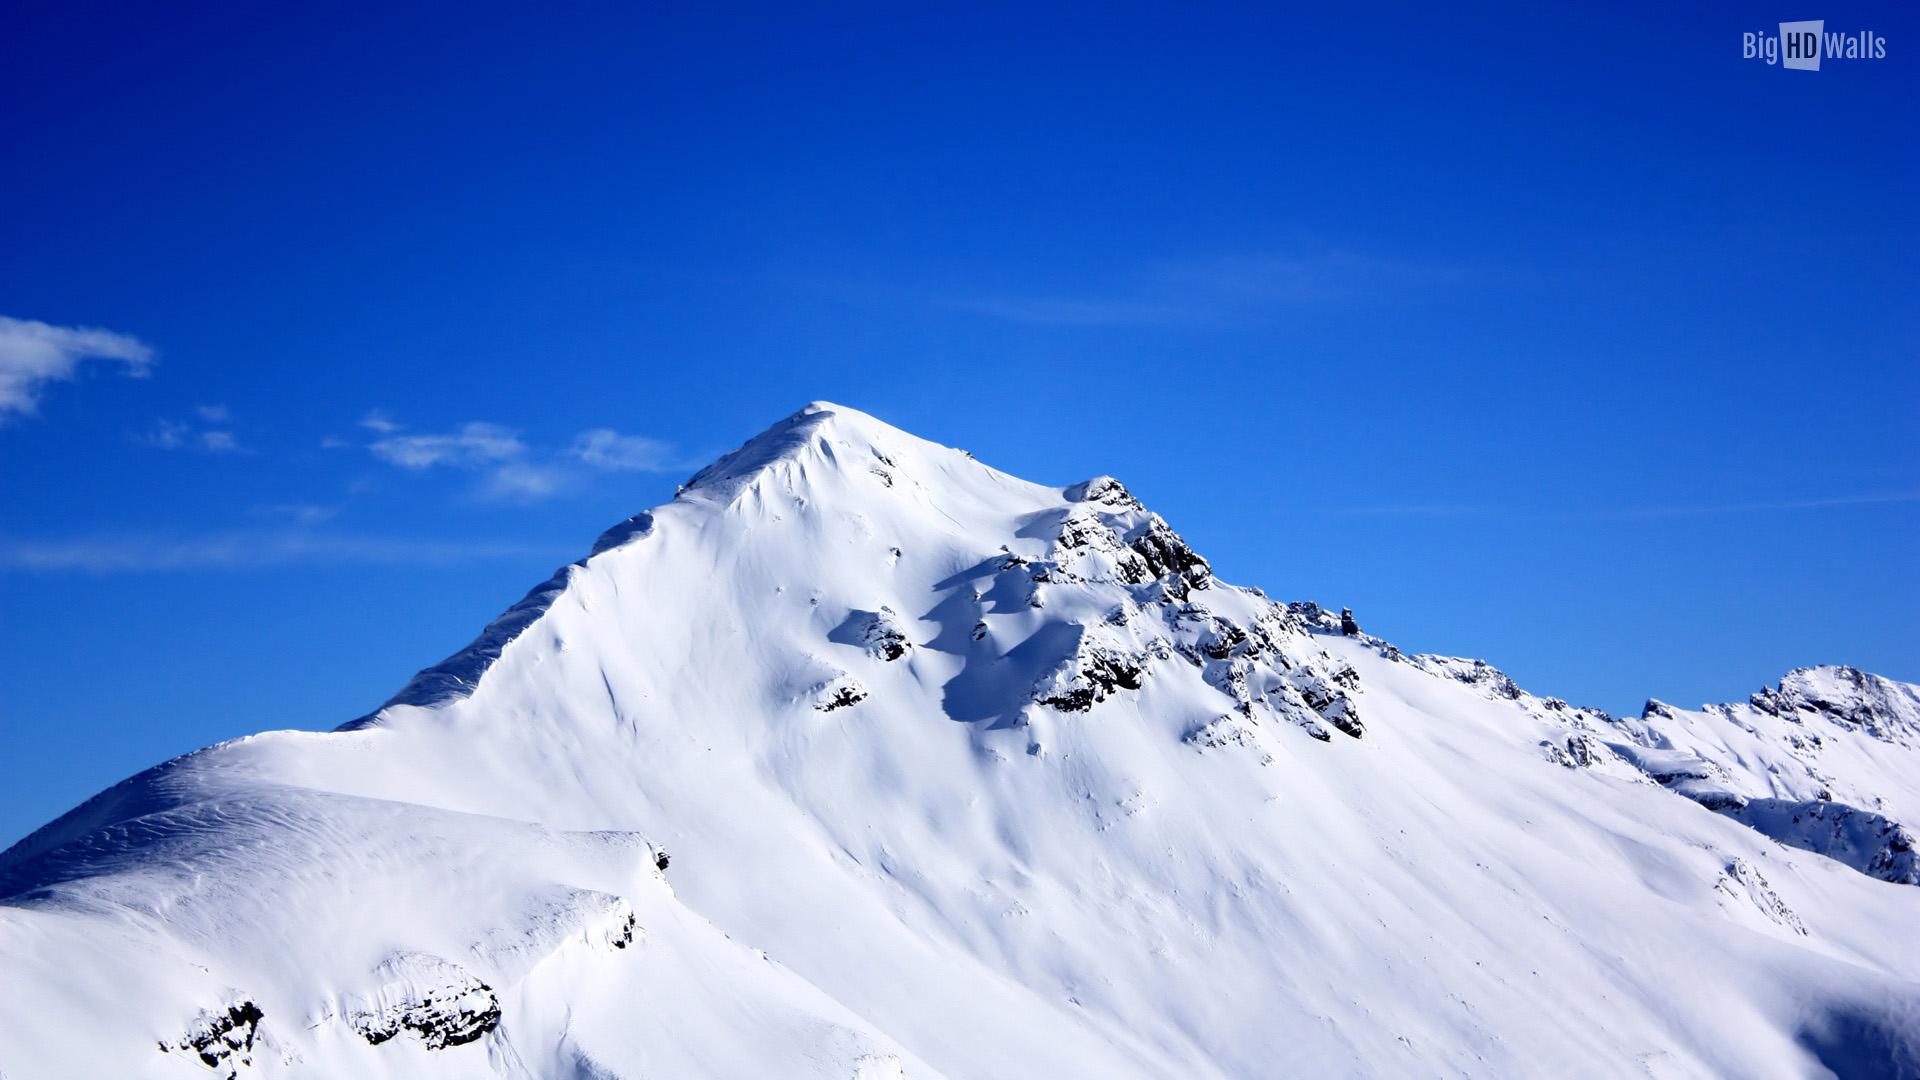 Snow covered peak HD Wallpaper | BigHDWalls